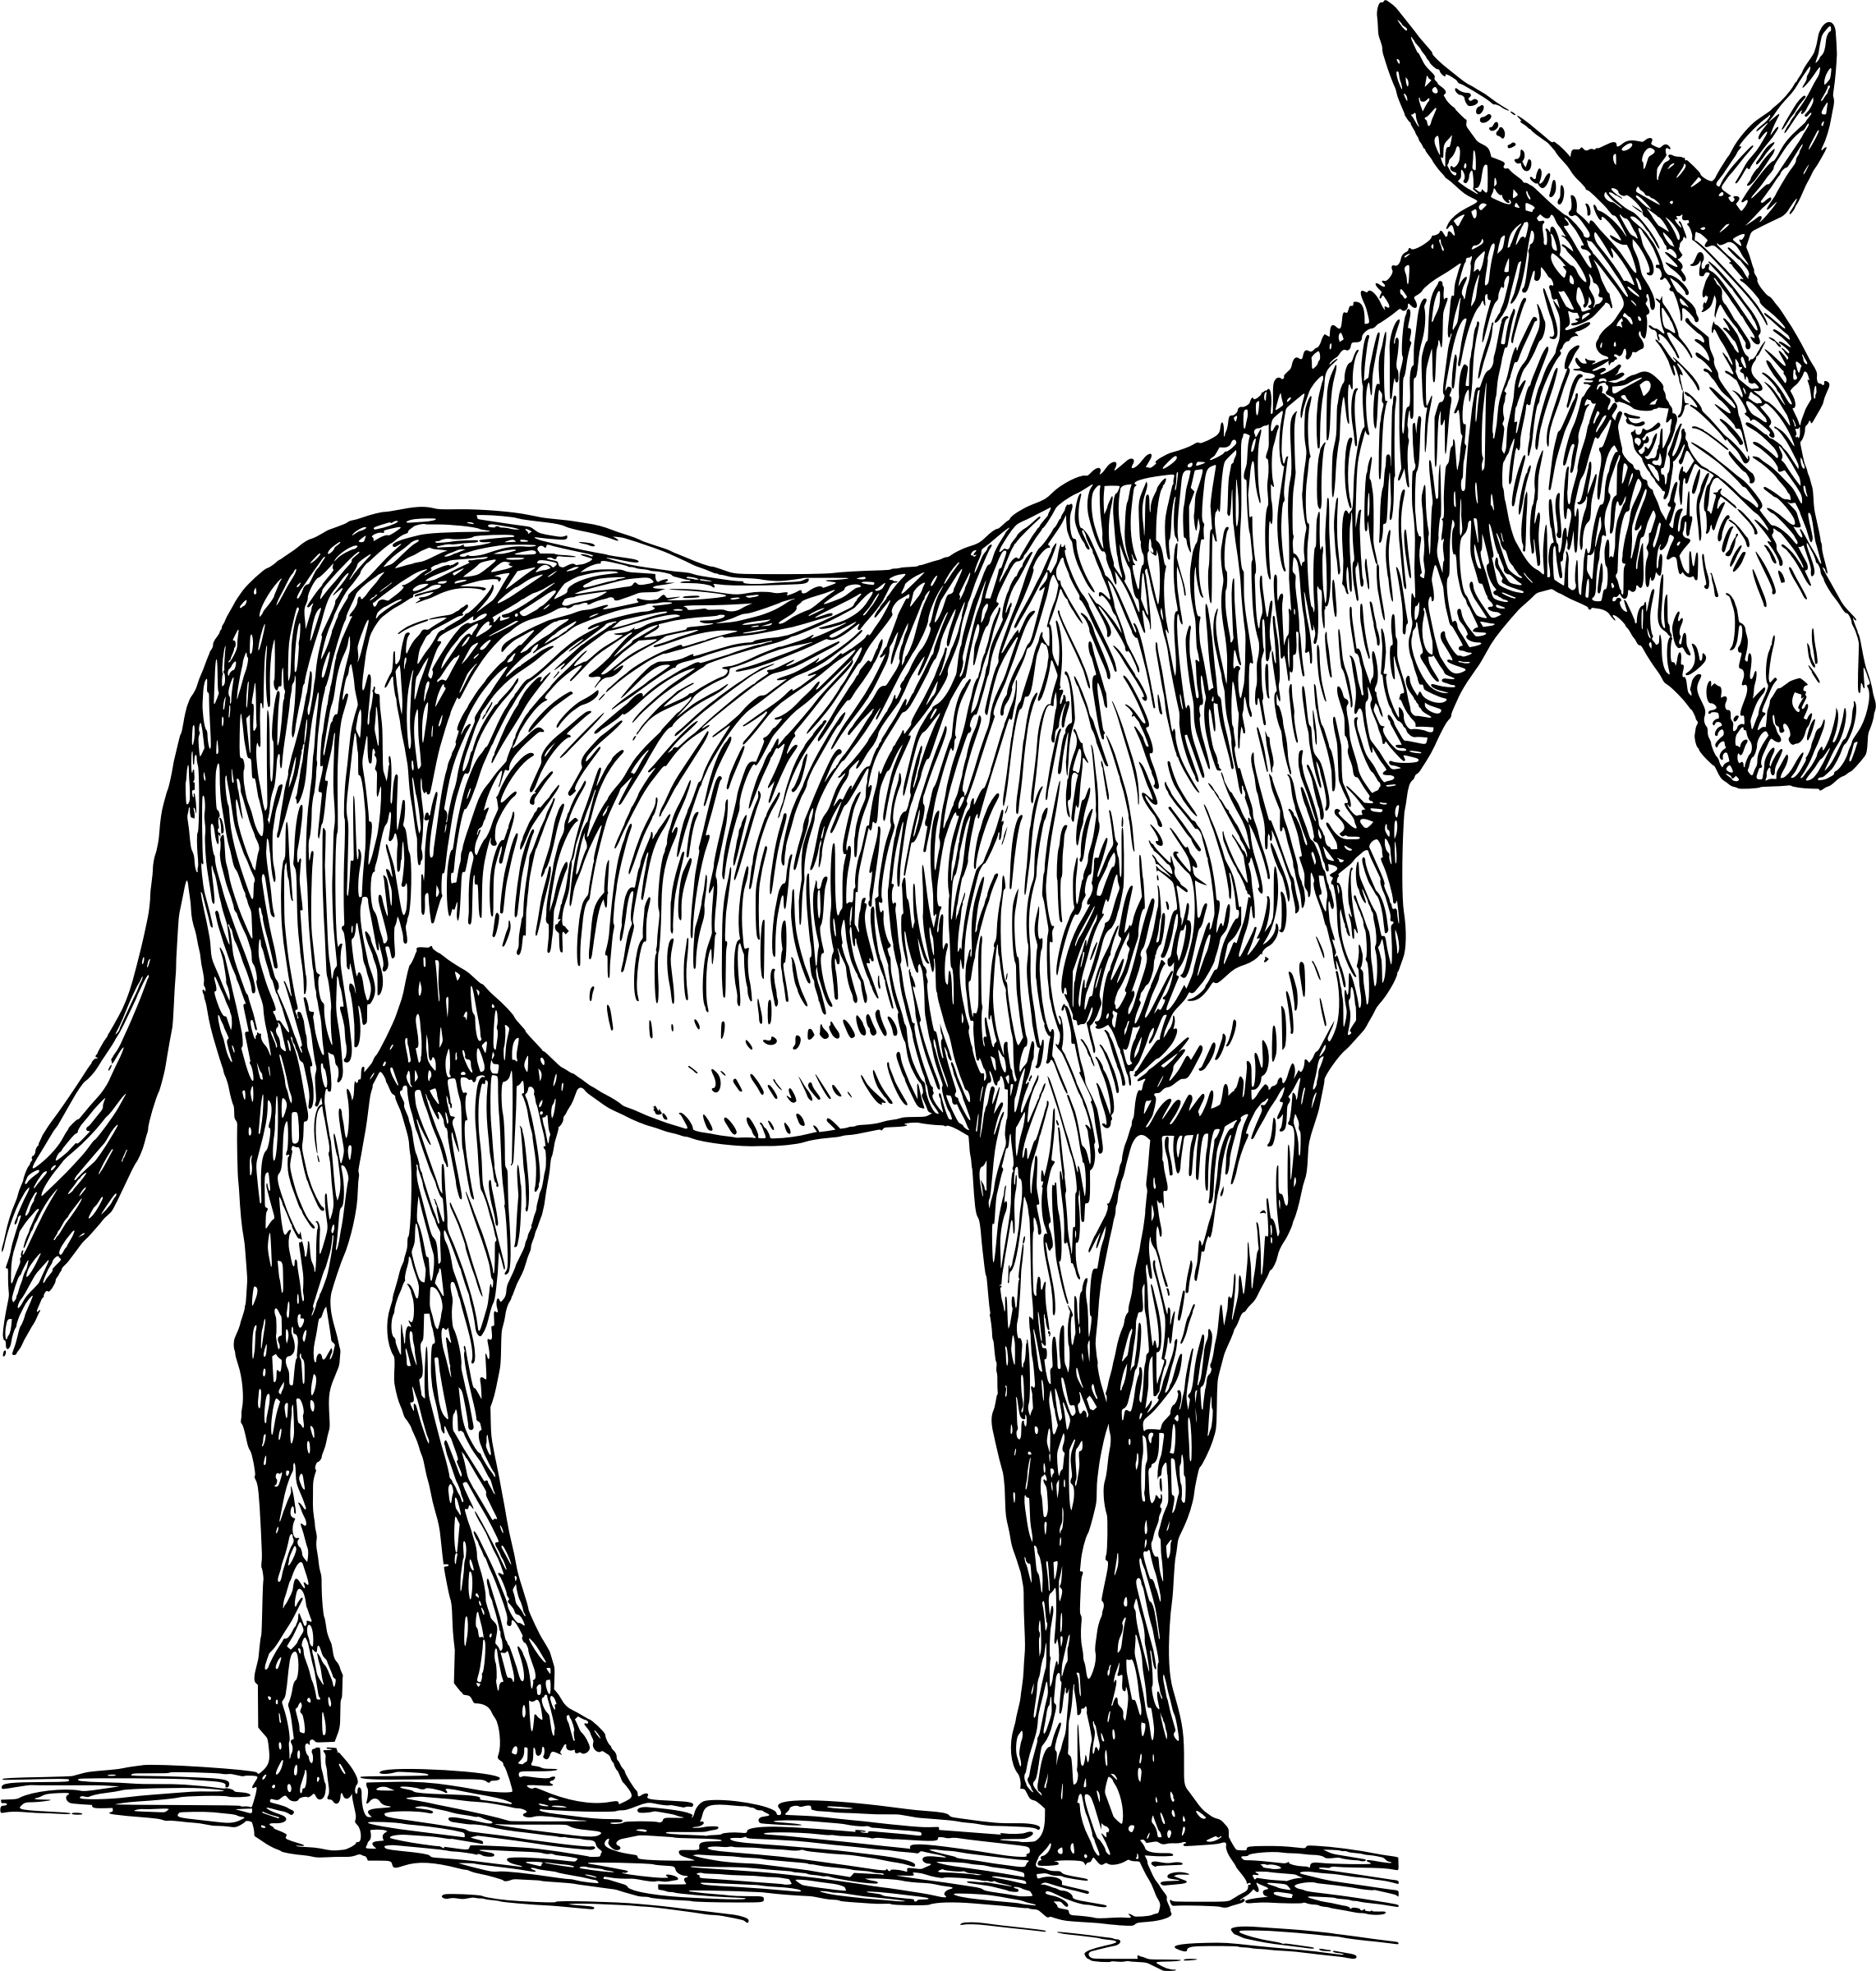 Clipart - Mule